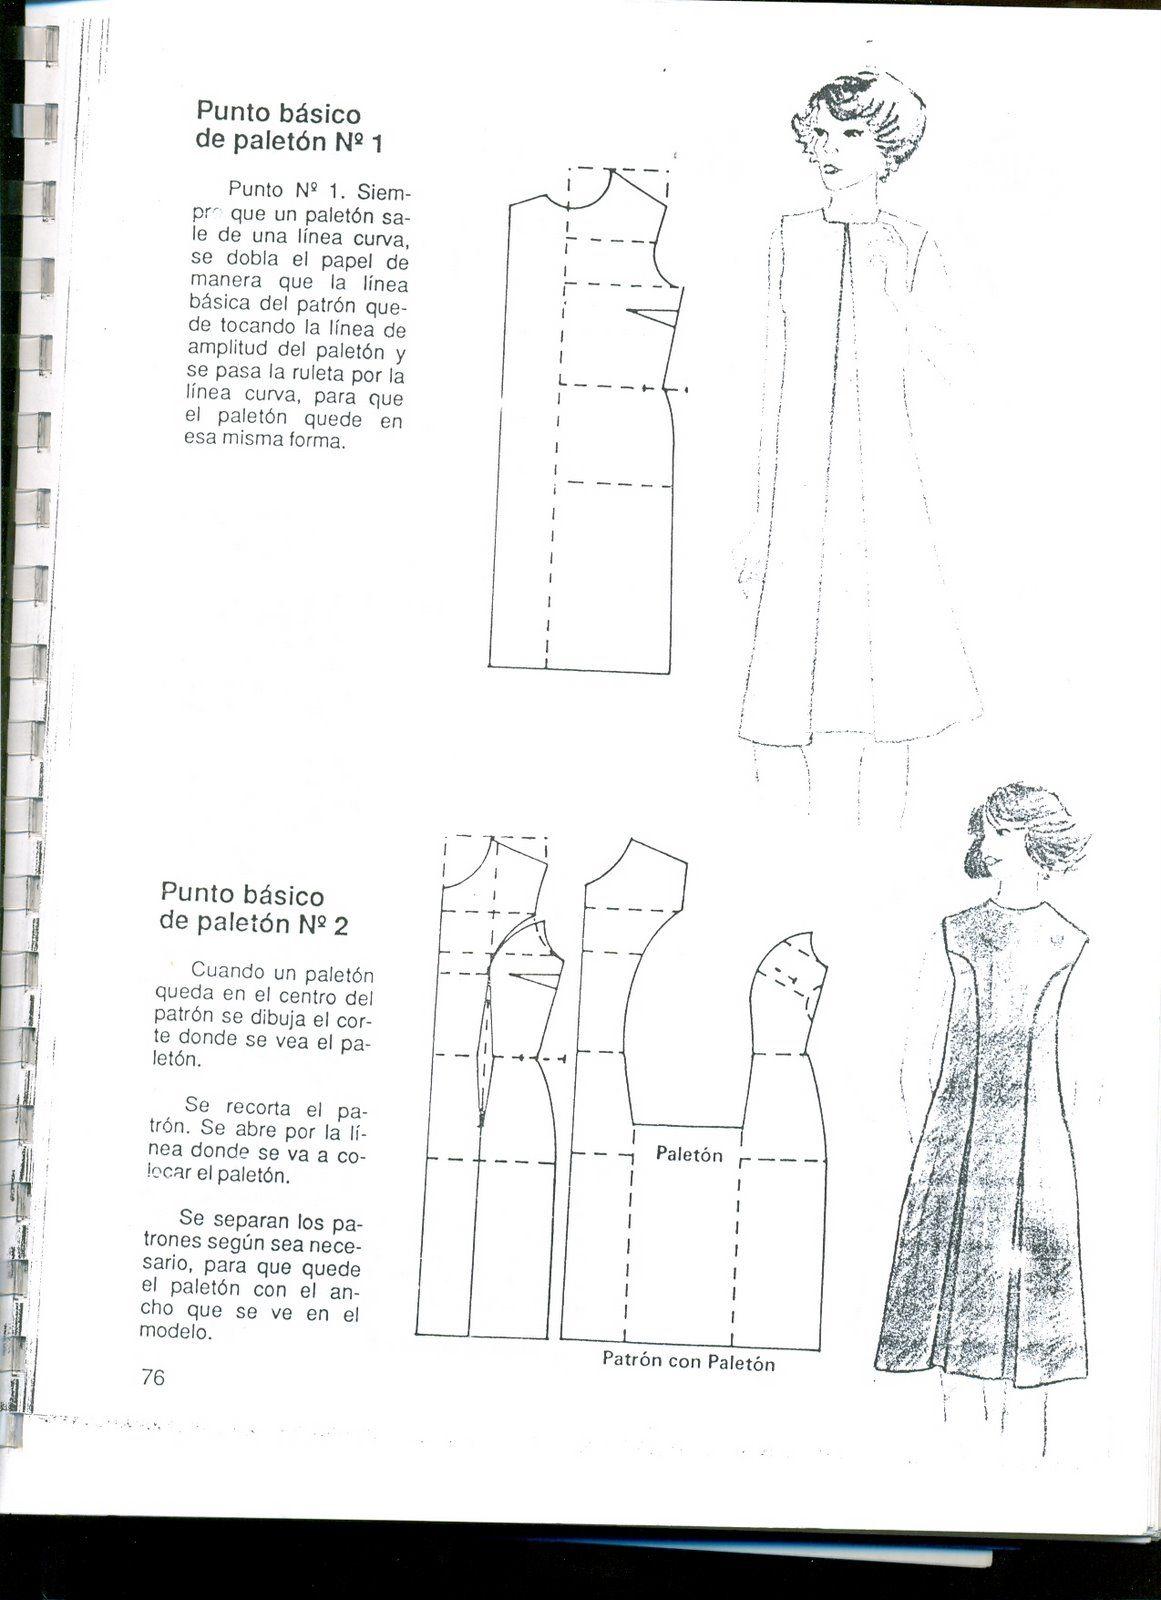 Archivo de álbumes | mi maquina de coser | Pinterest | Álbum ...